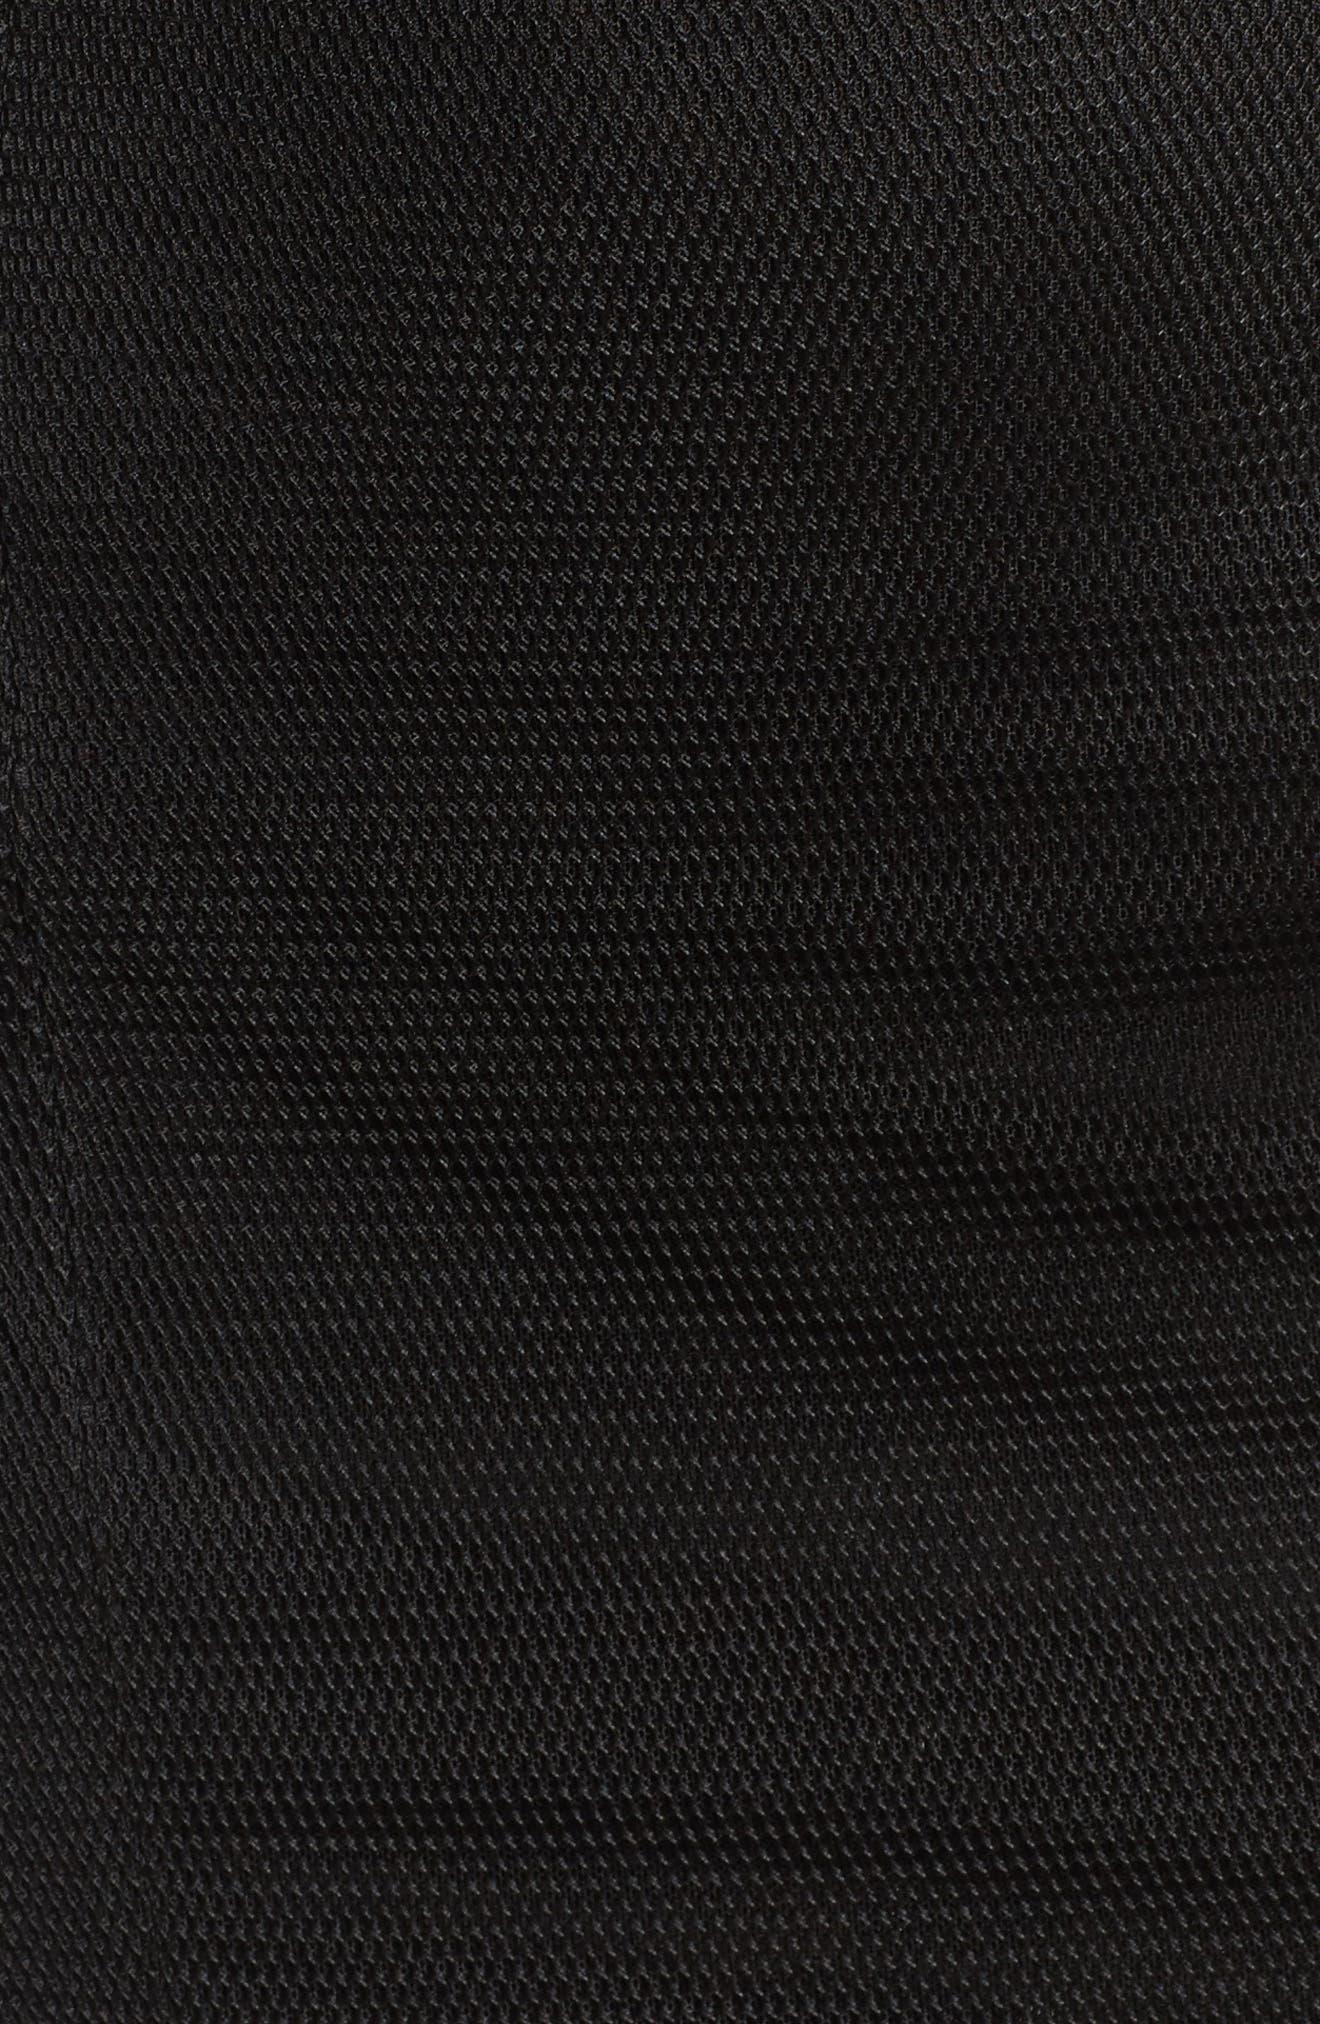 Fate Off the Shoulder Dress,                             Alternate thumbnail 5, color,                             Black